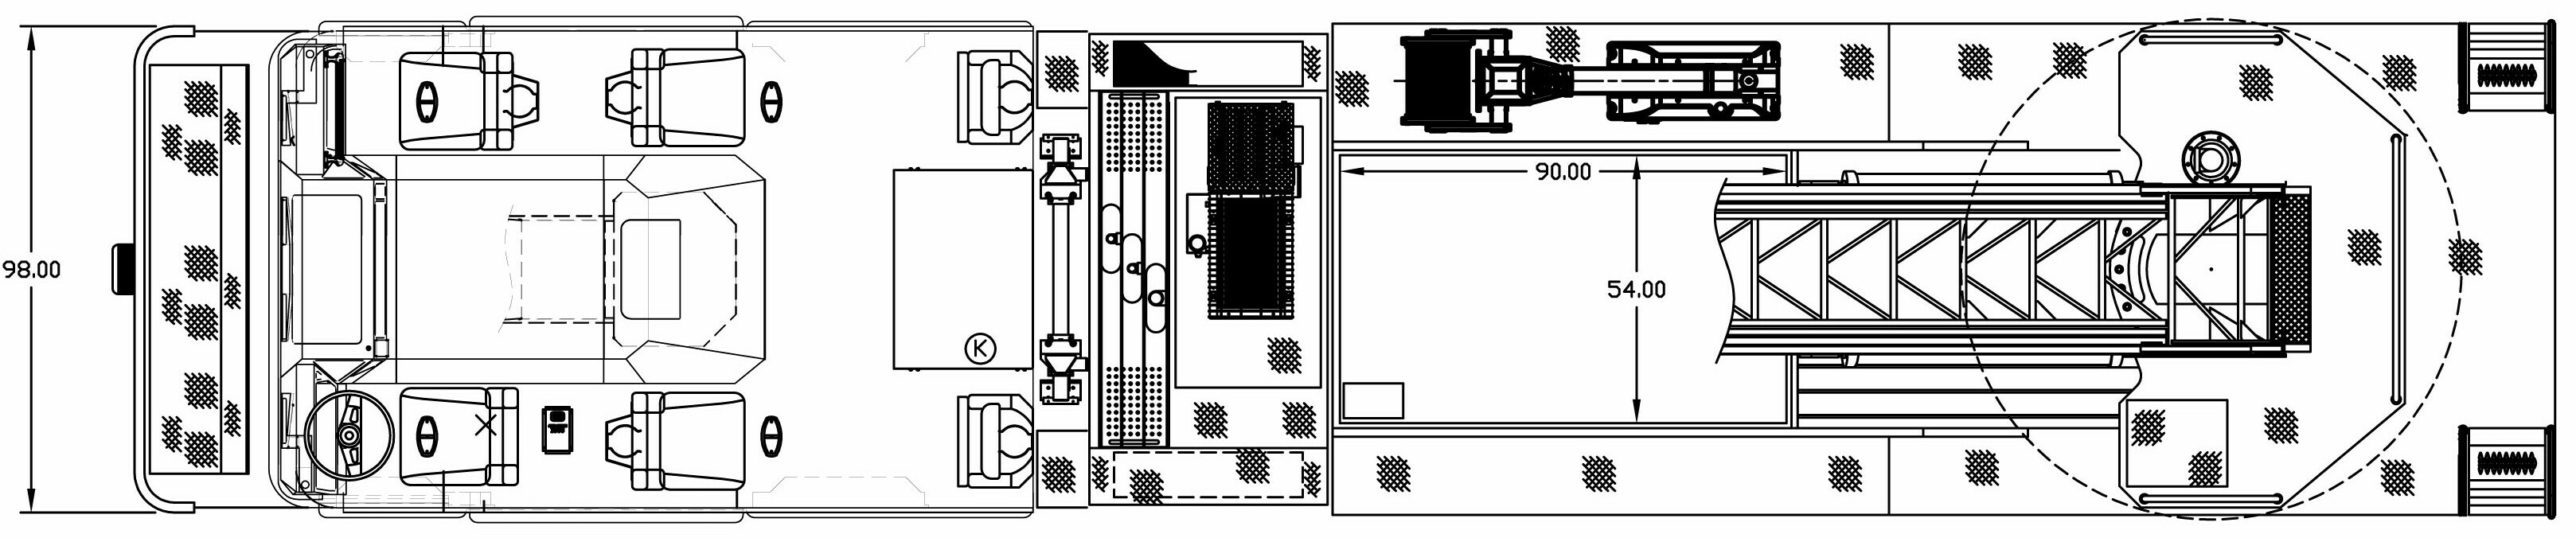 Seagrave Aerial 100 blueprint